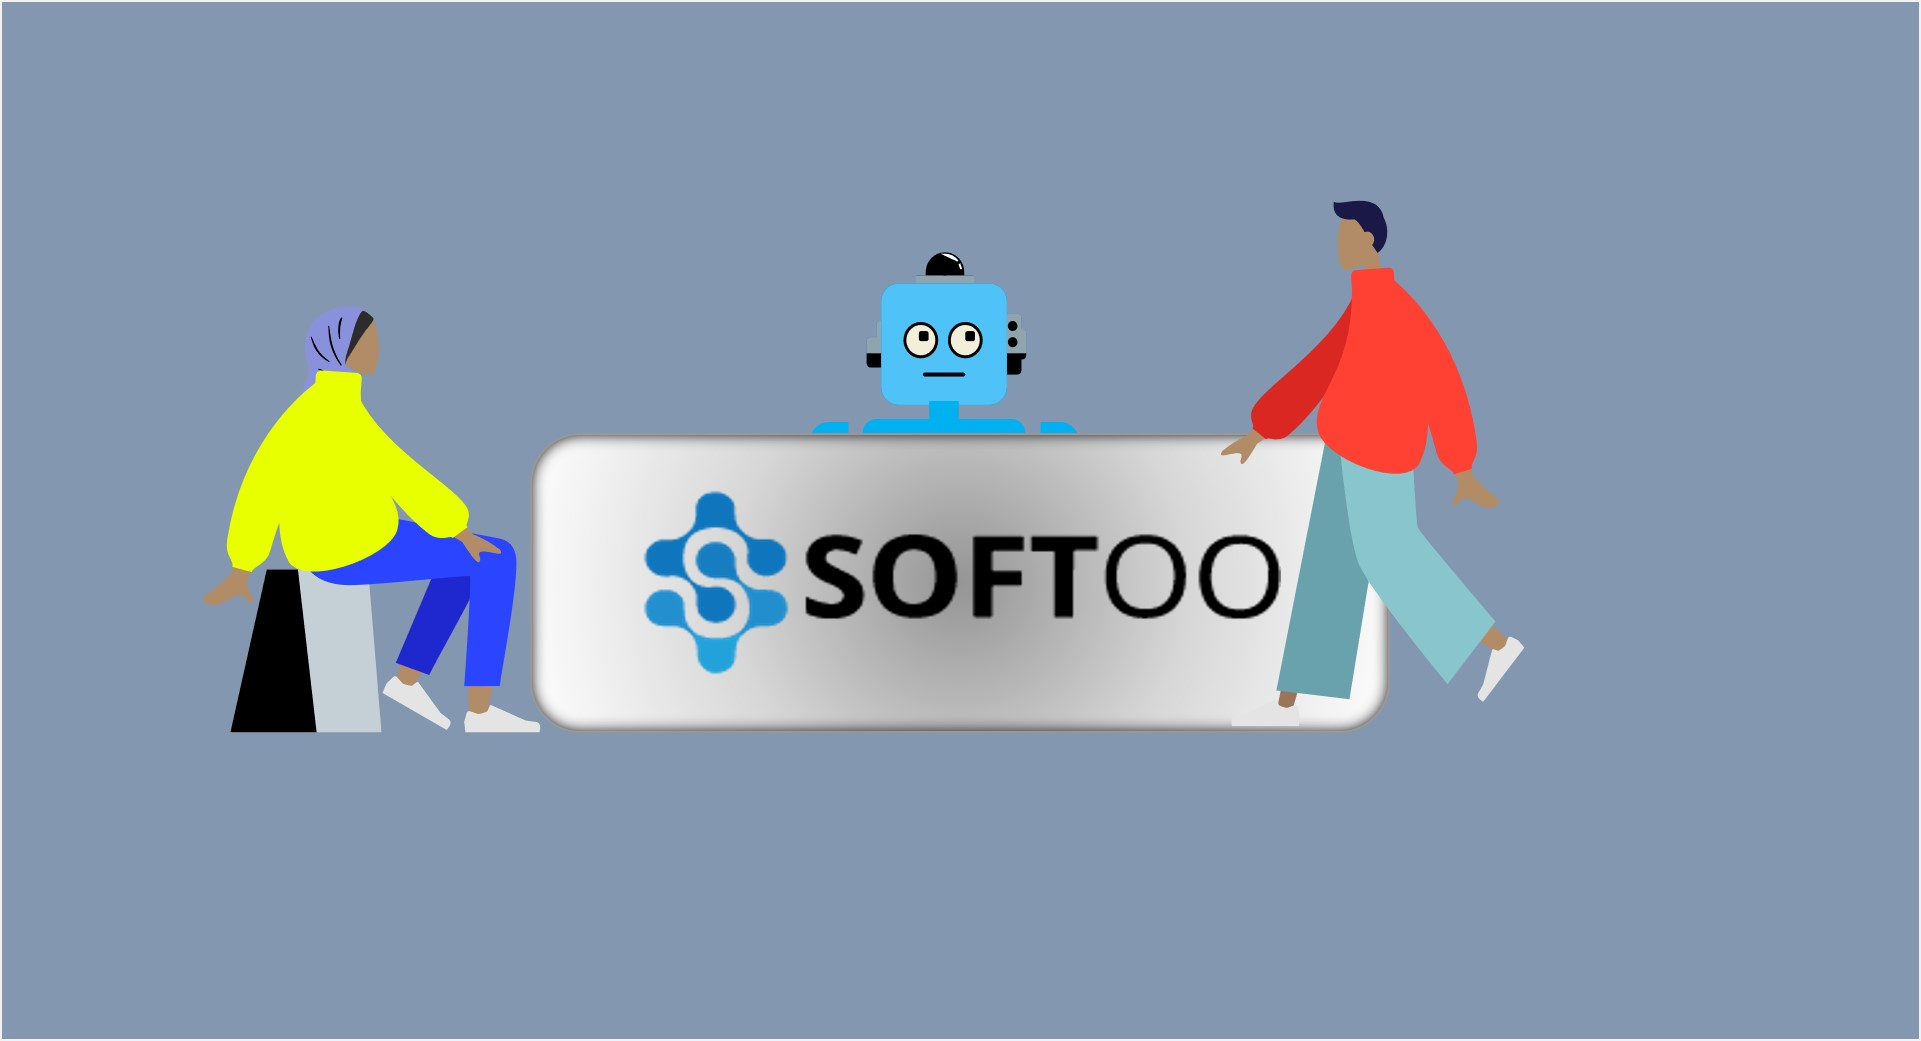 Softoo hellp-desk